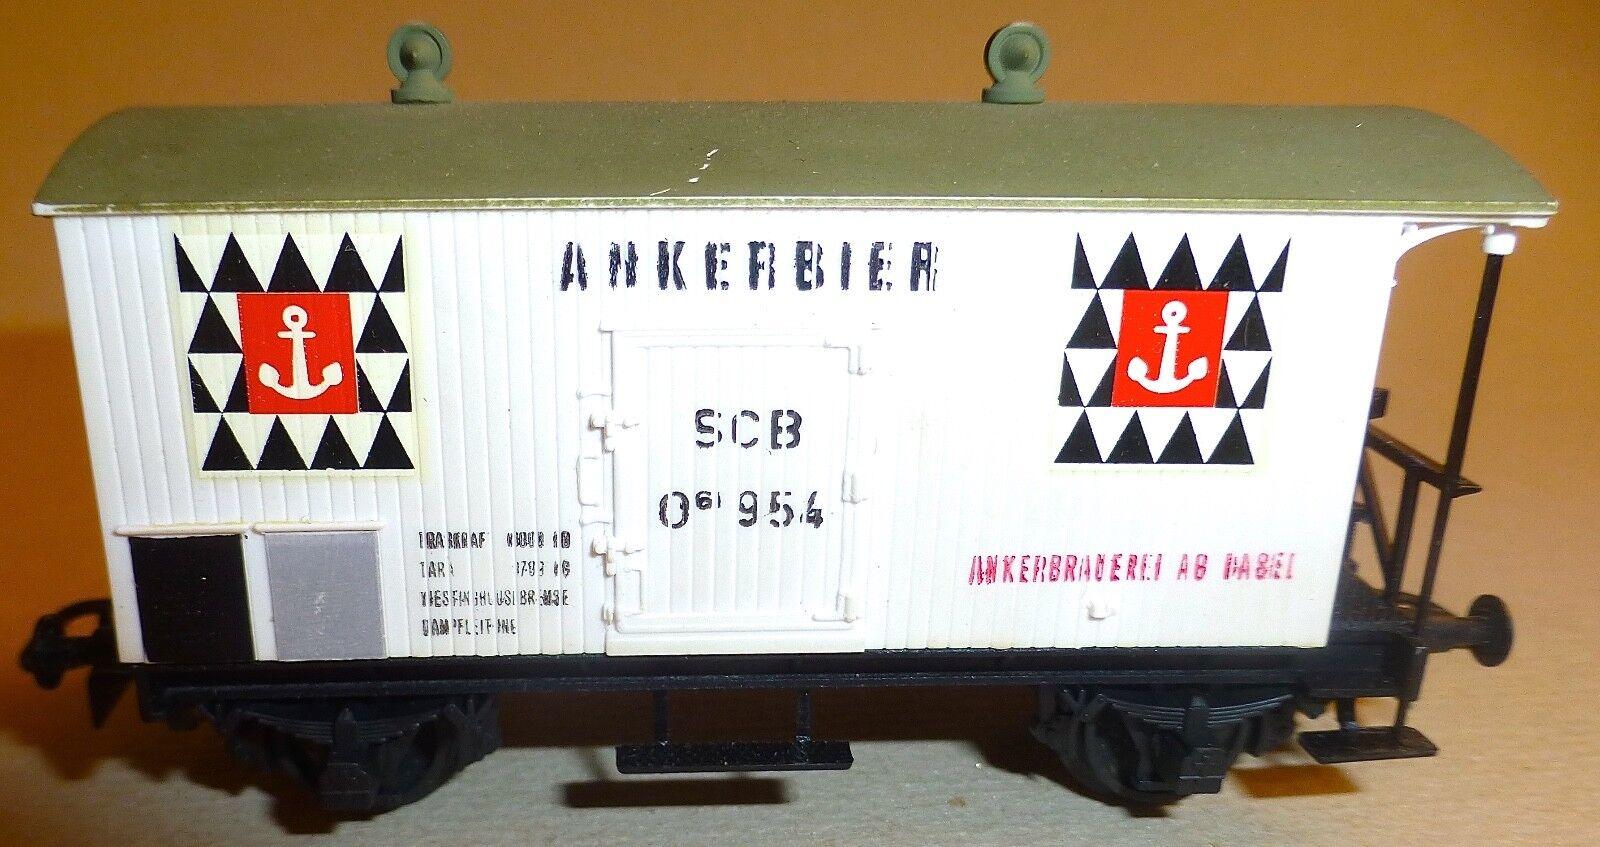 Ankerbier Svizzera Svizzera Svizzera Central Ferrovia Scb 06 954 P Ruco Switzerland H0 1 87 HE3 Å ab6bb8